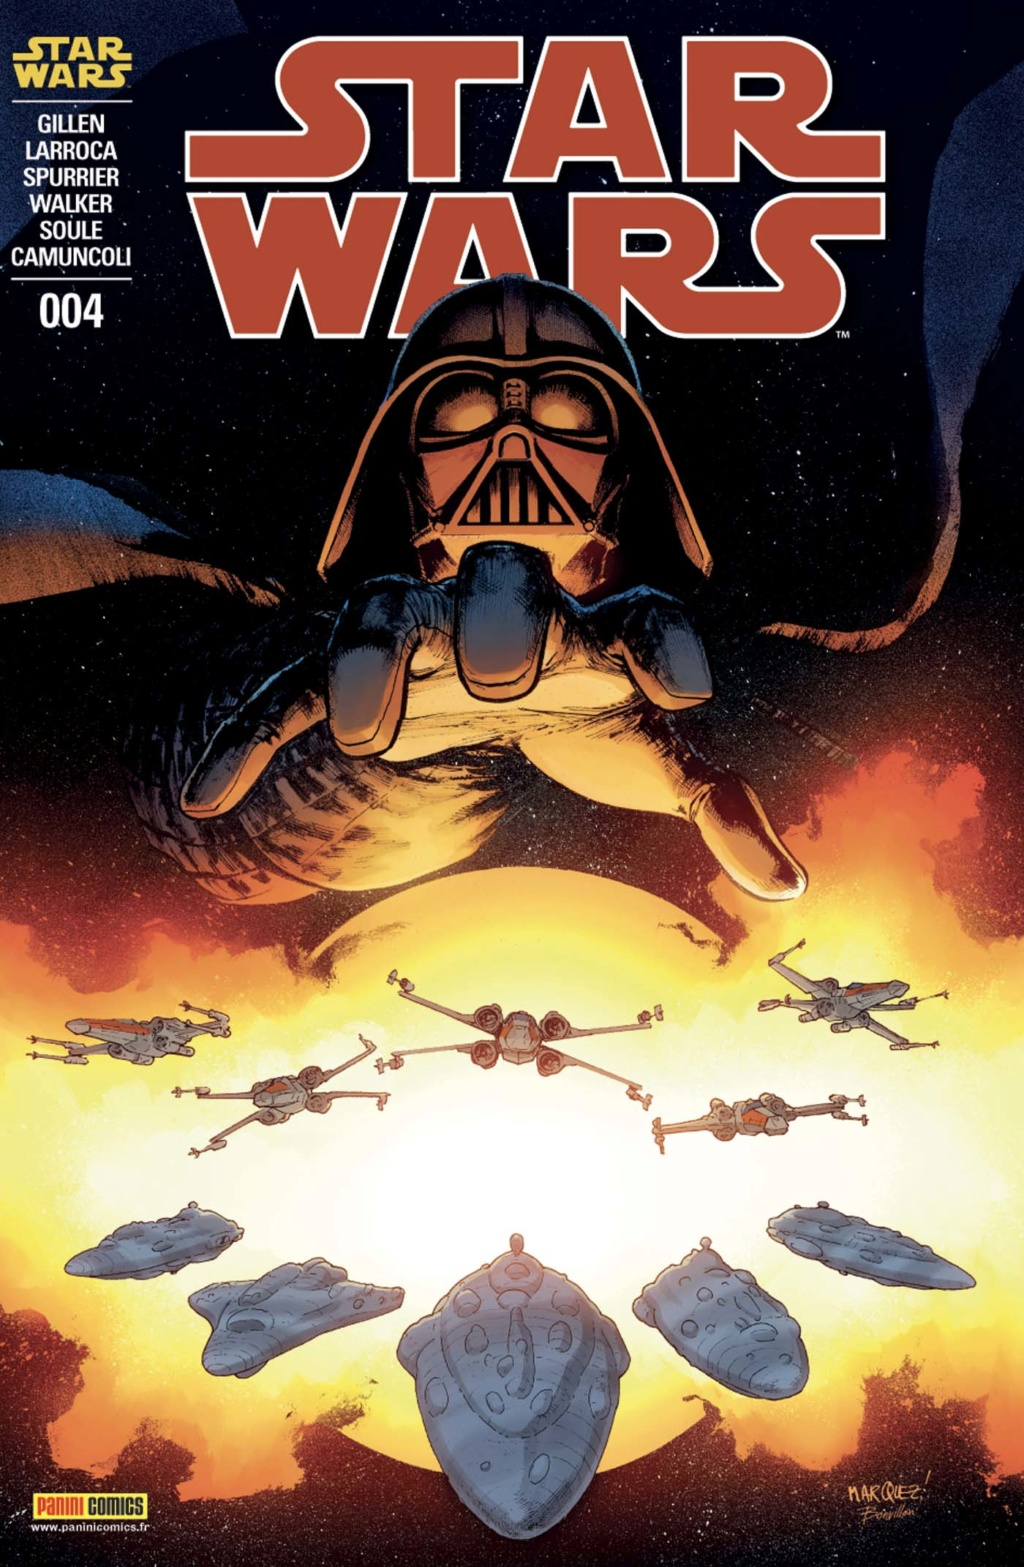 MAGAZINE STAR WARS #04 V3 (29) PANINI - Juillet 2019  97828018